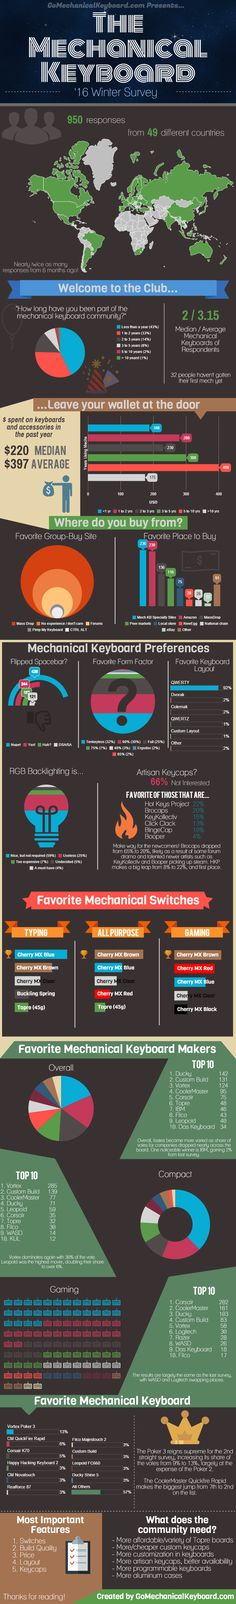 Mechanical Keyboard Enthusiast Survey